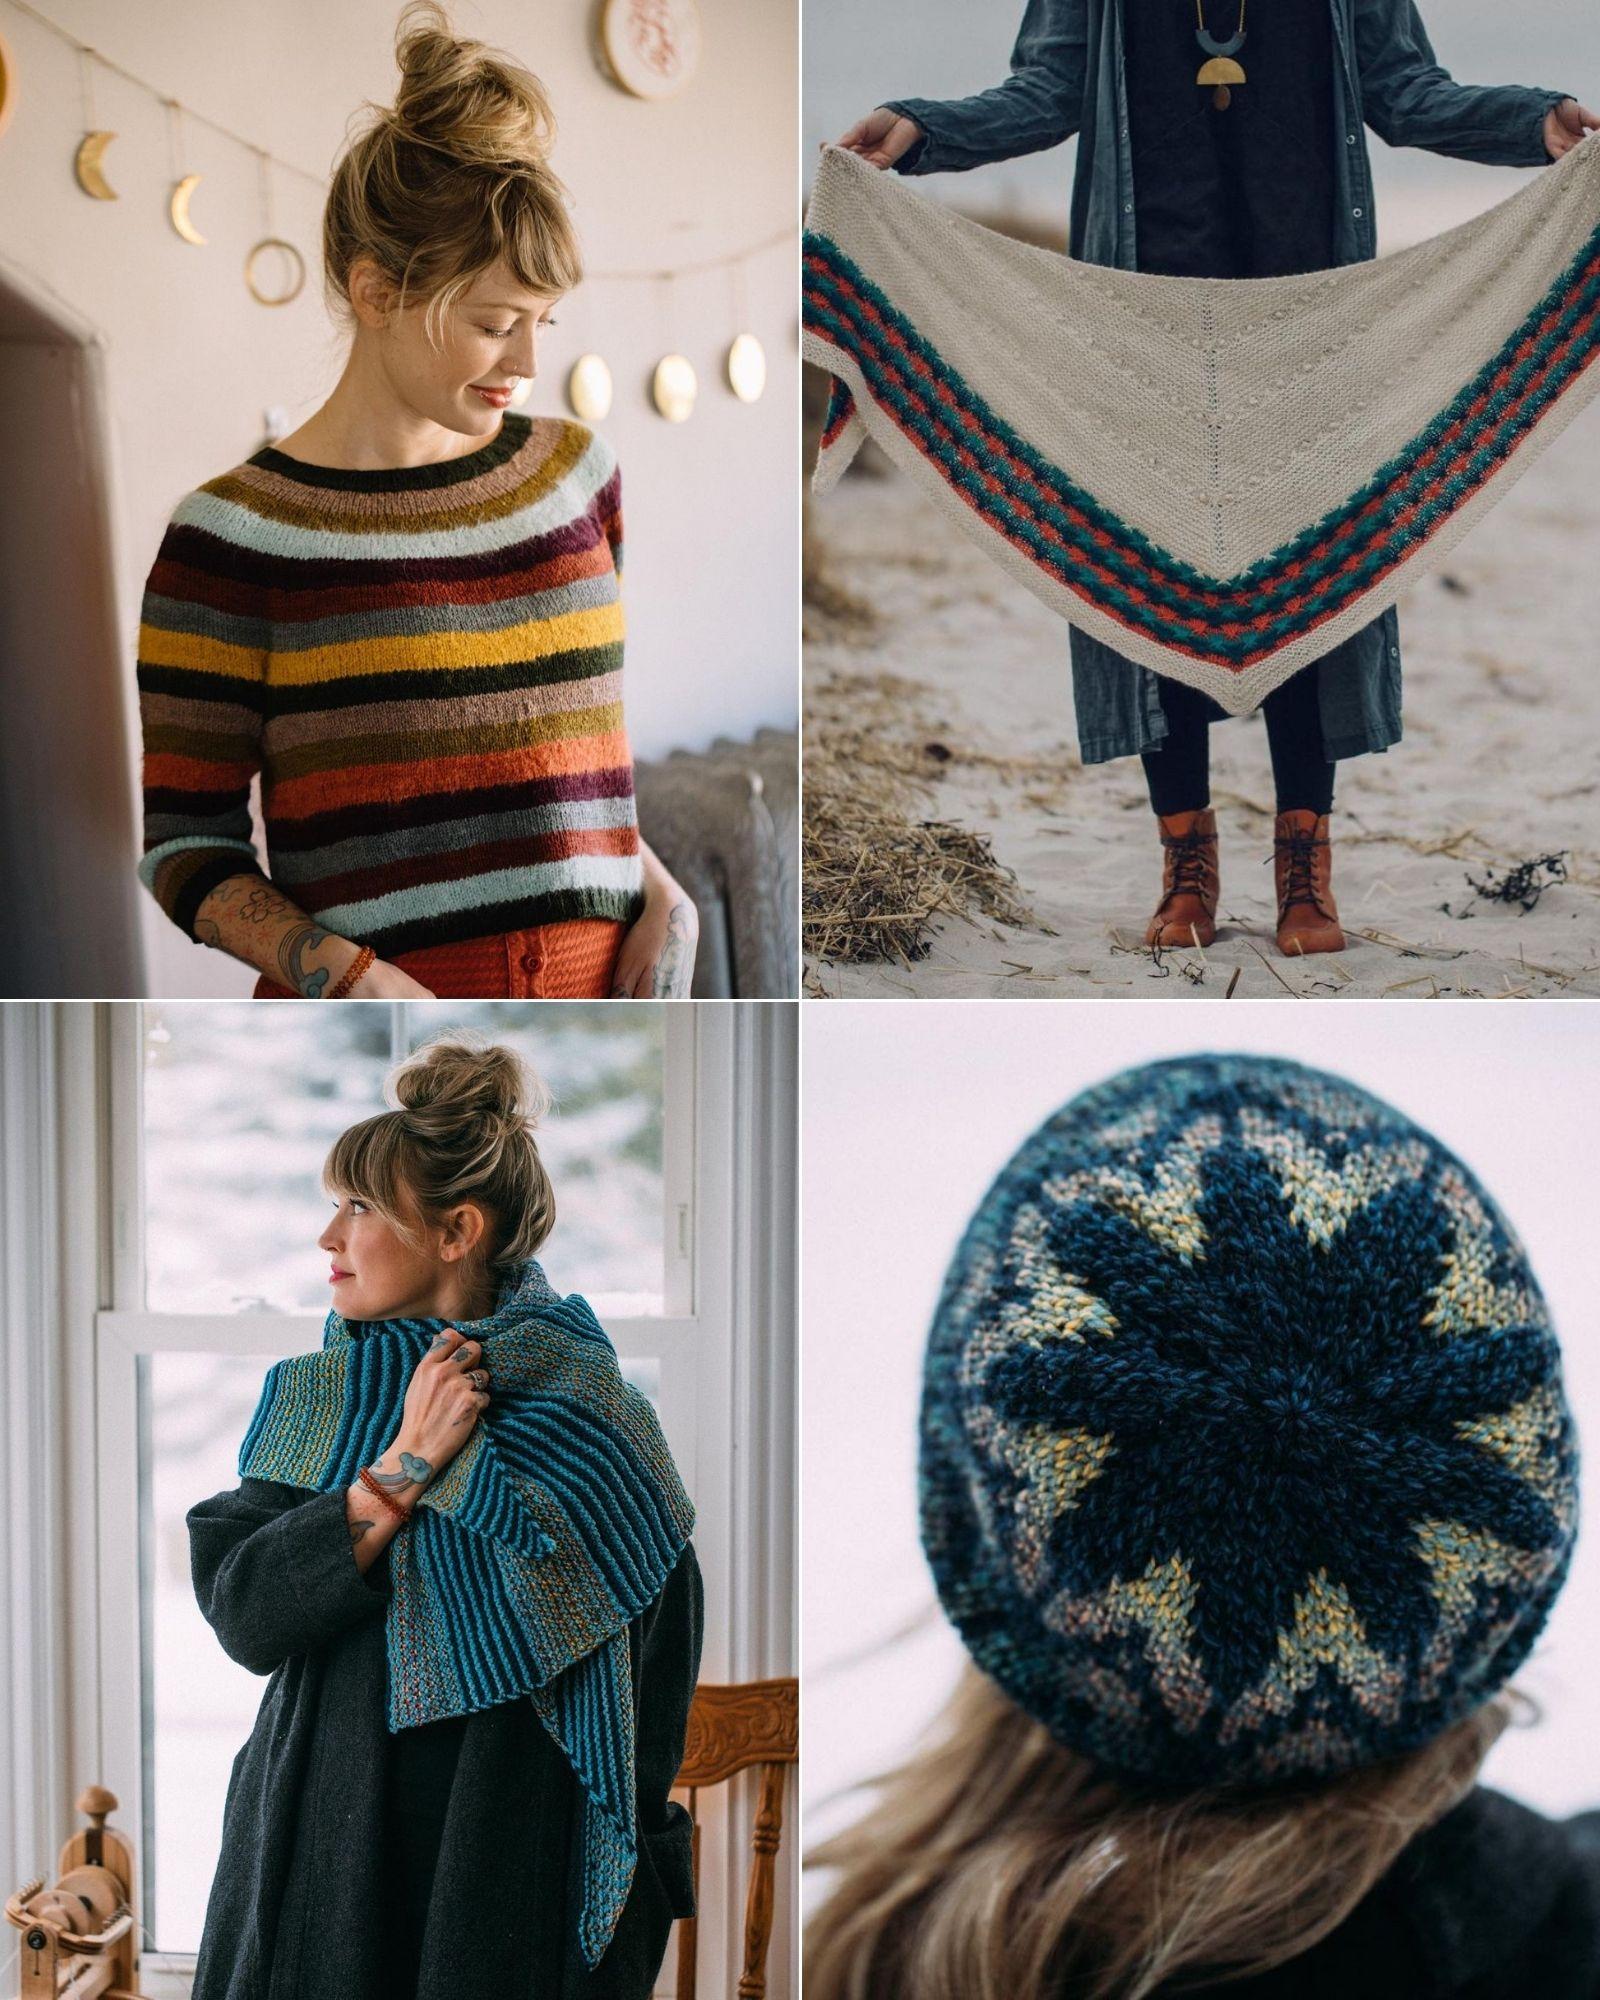 Tài khoản Instagram @dreareneeknits truyền cảm hứng đan len